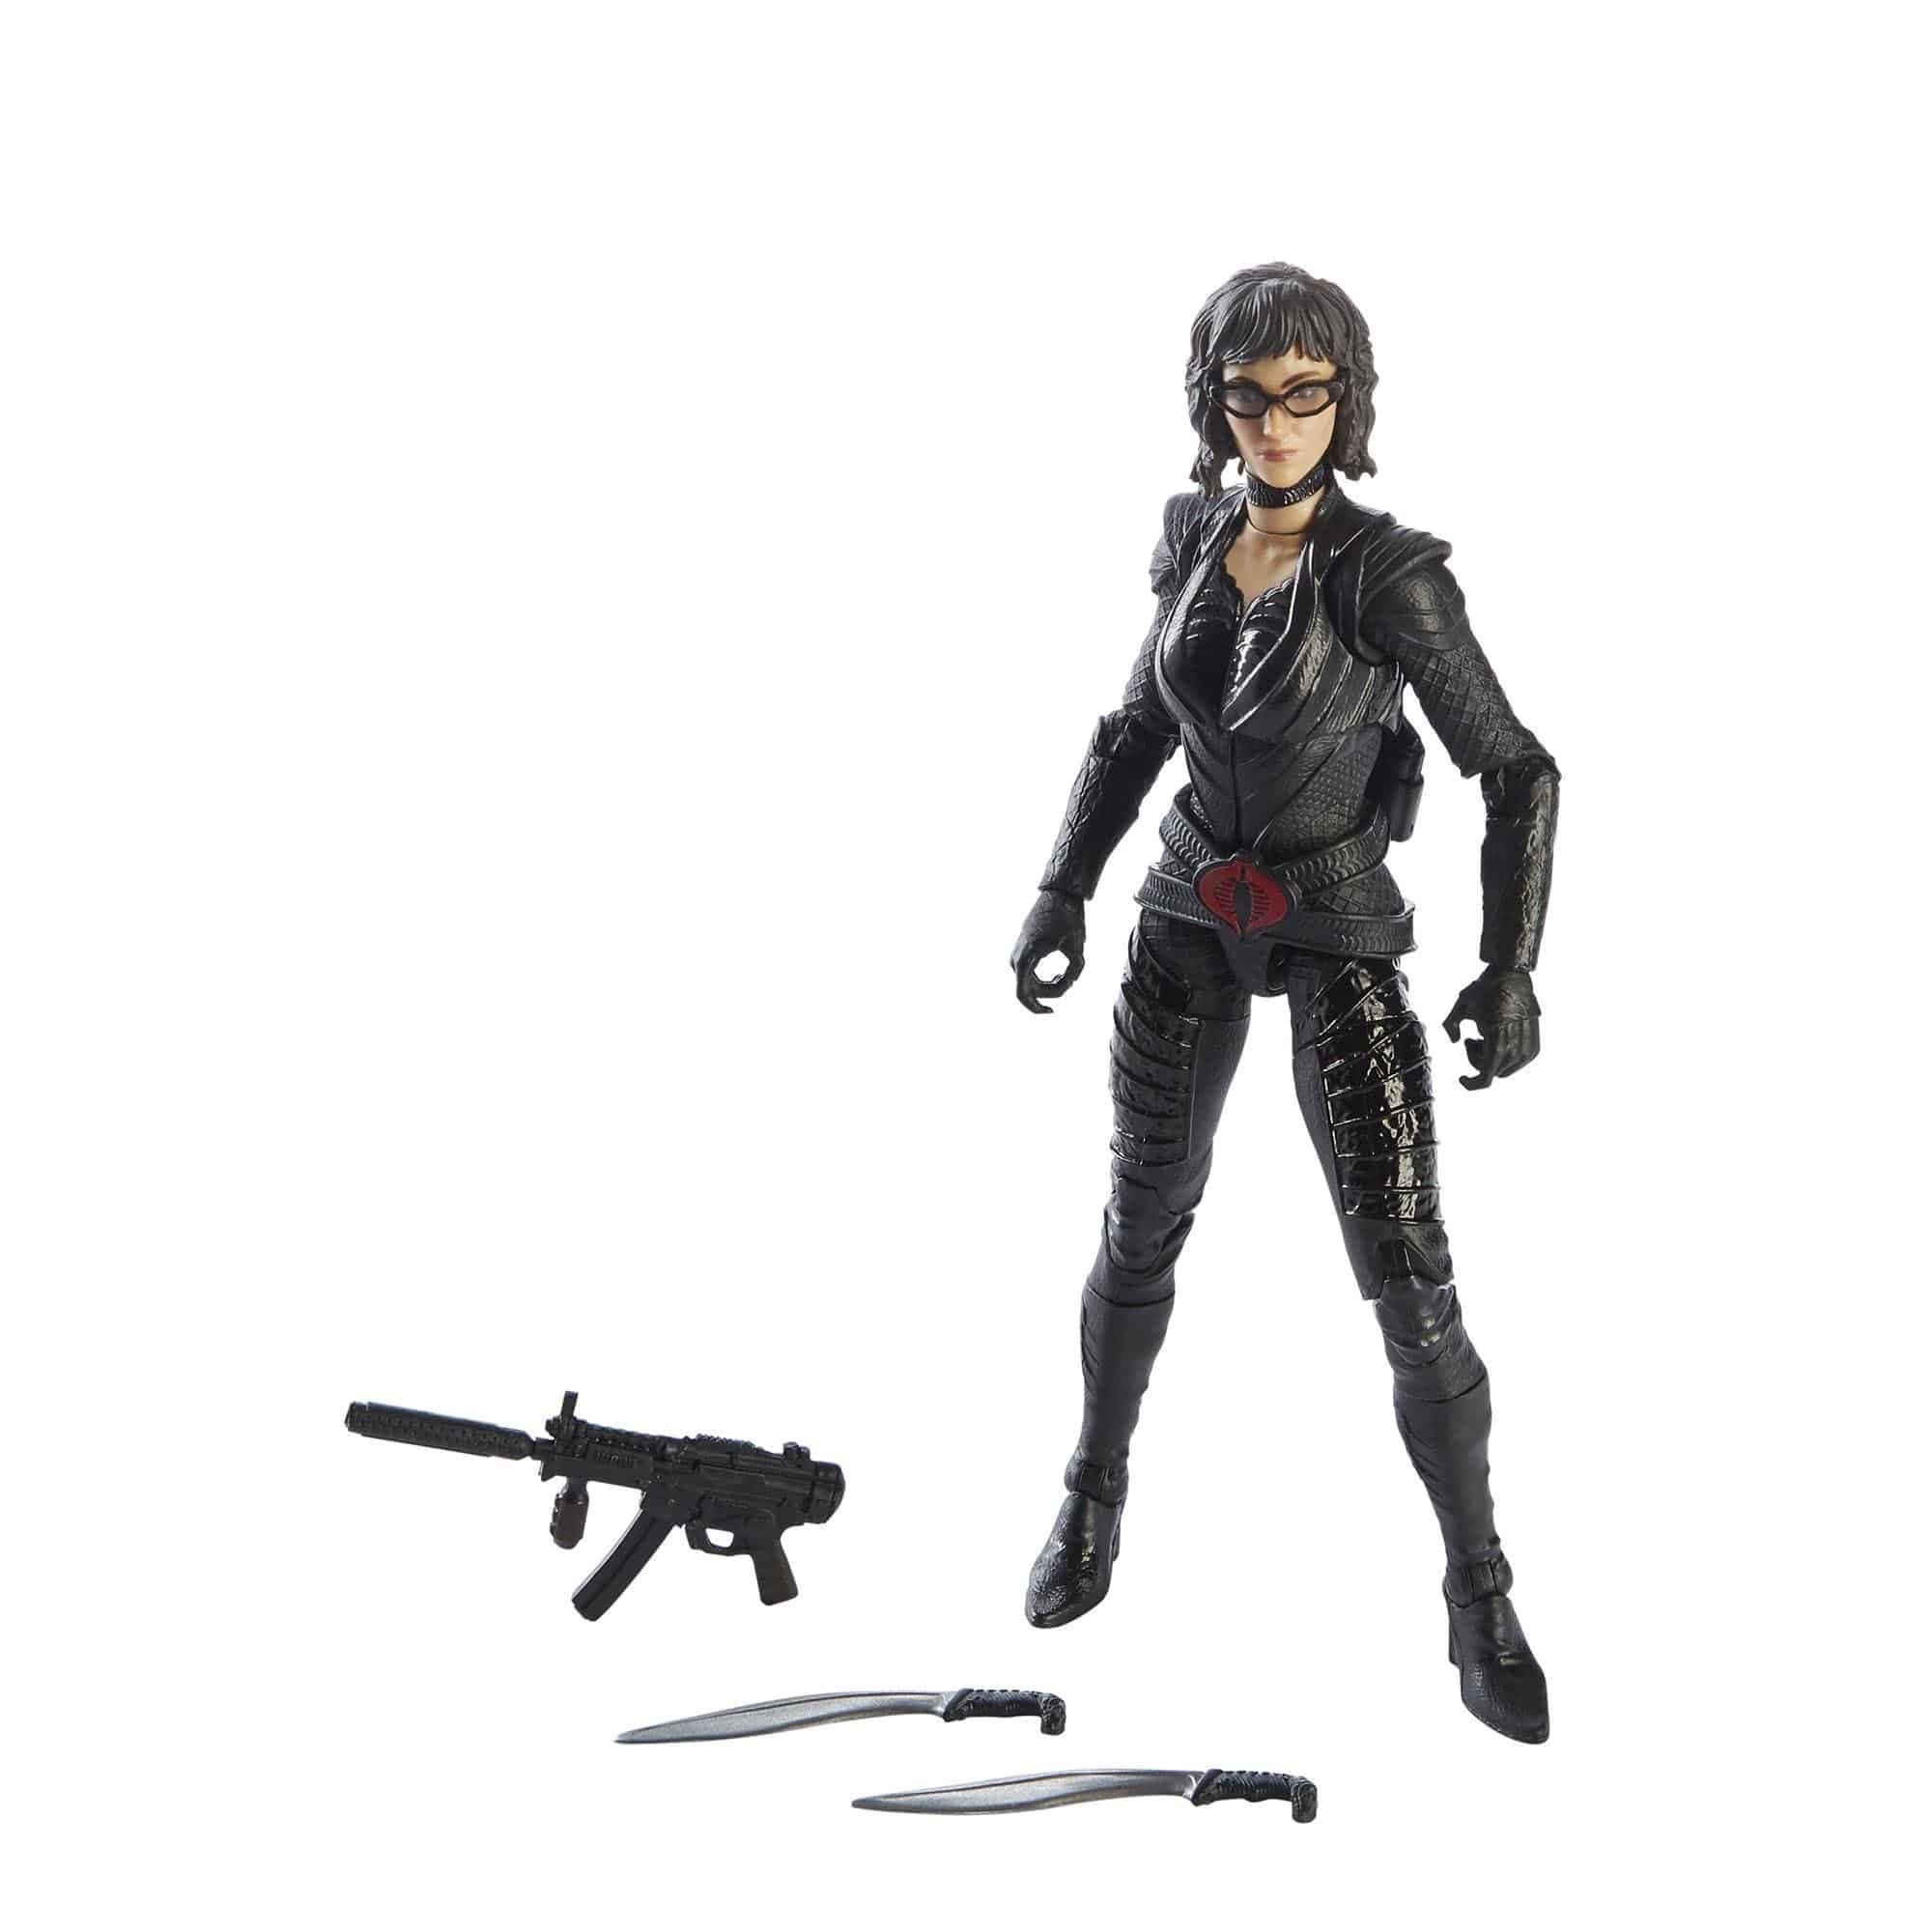 Úrsula Corberó already has her action figure from Snake Eyes: El Origen